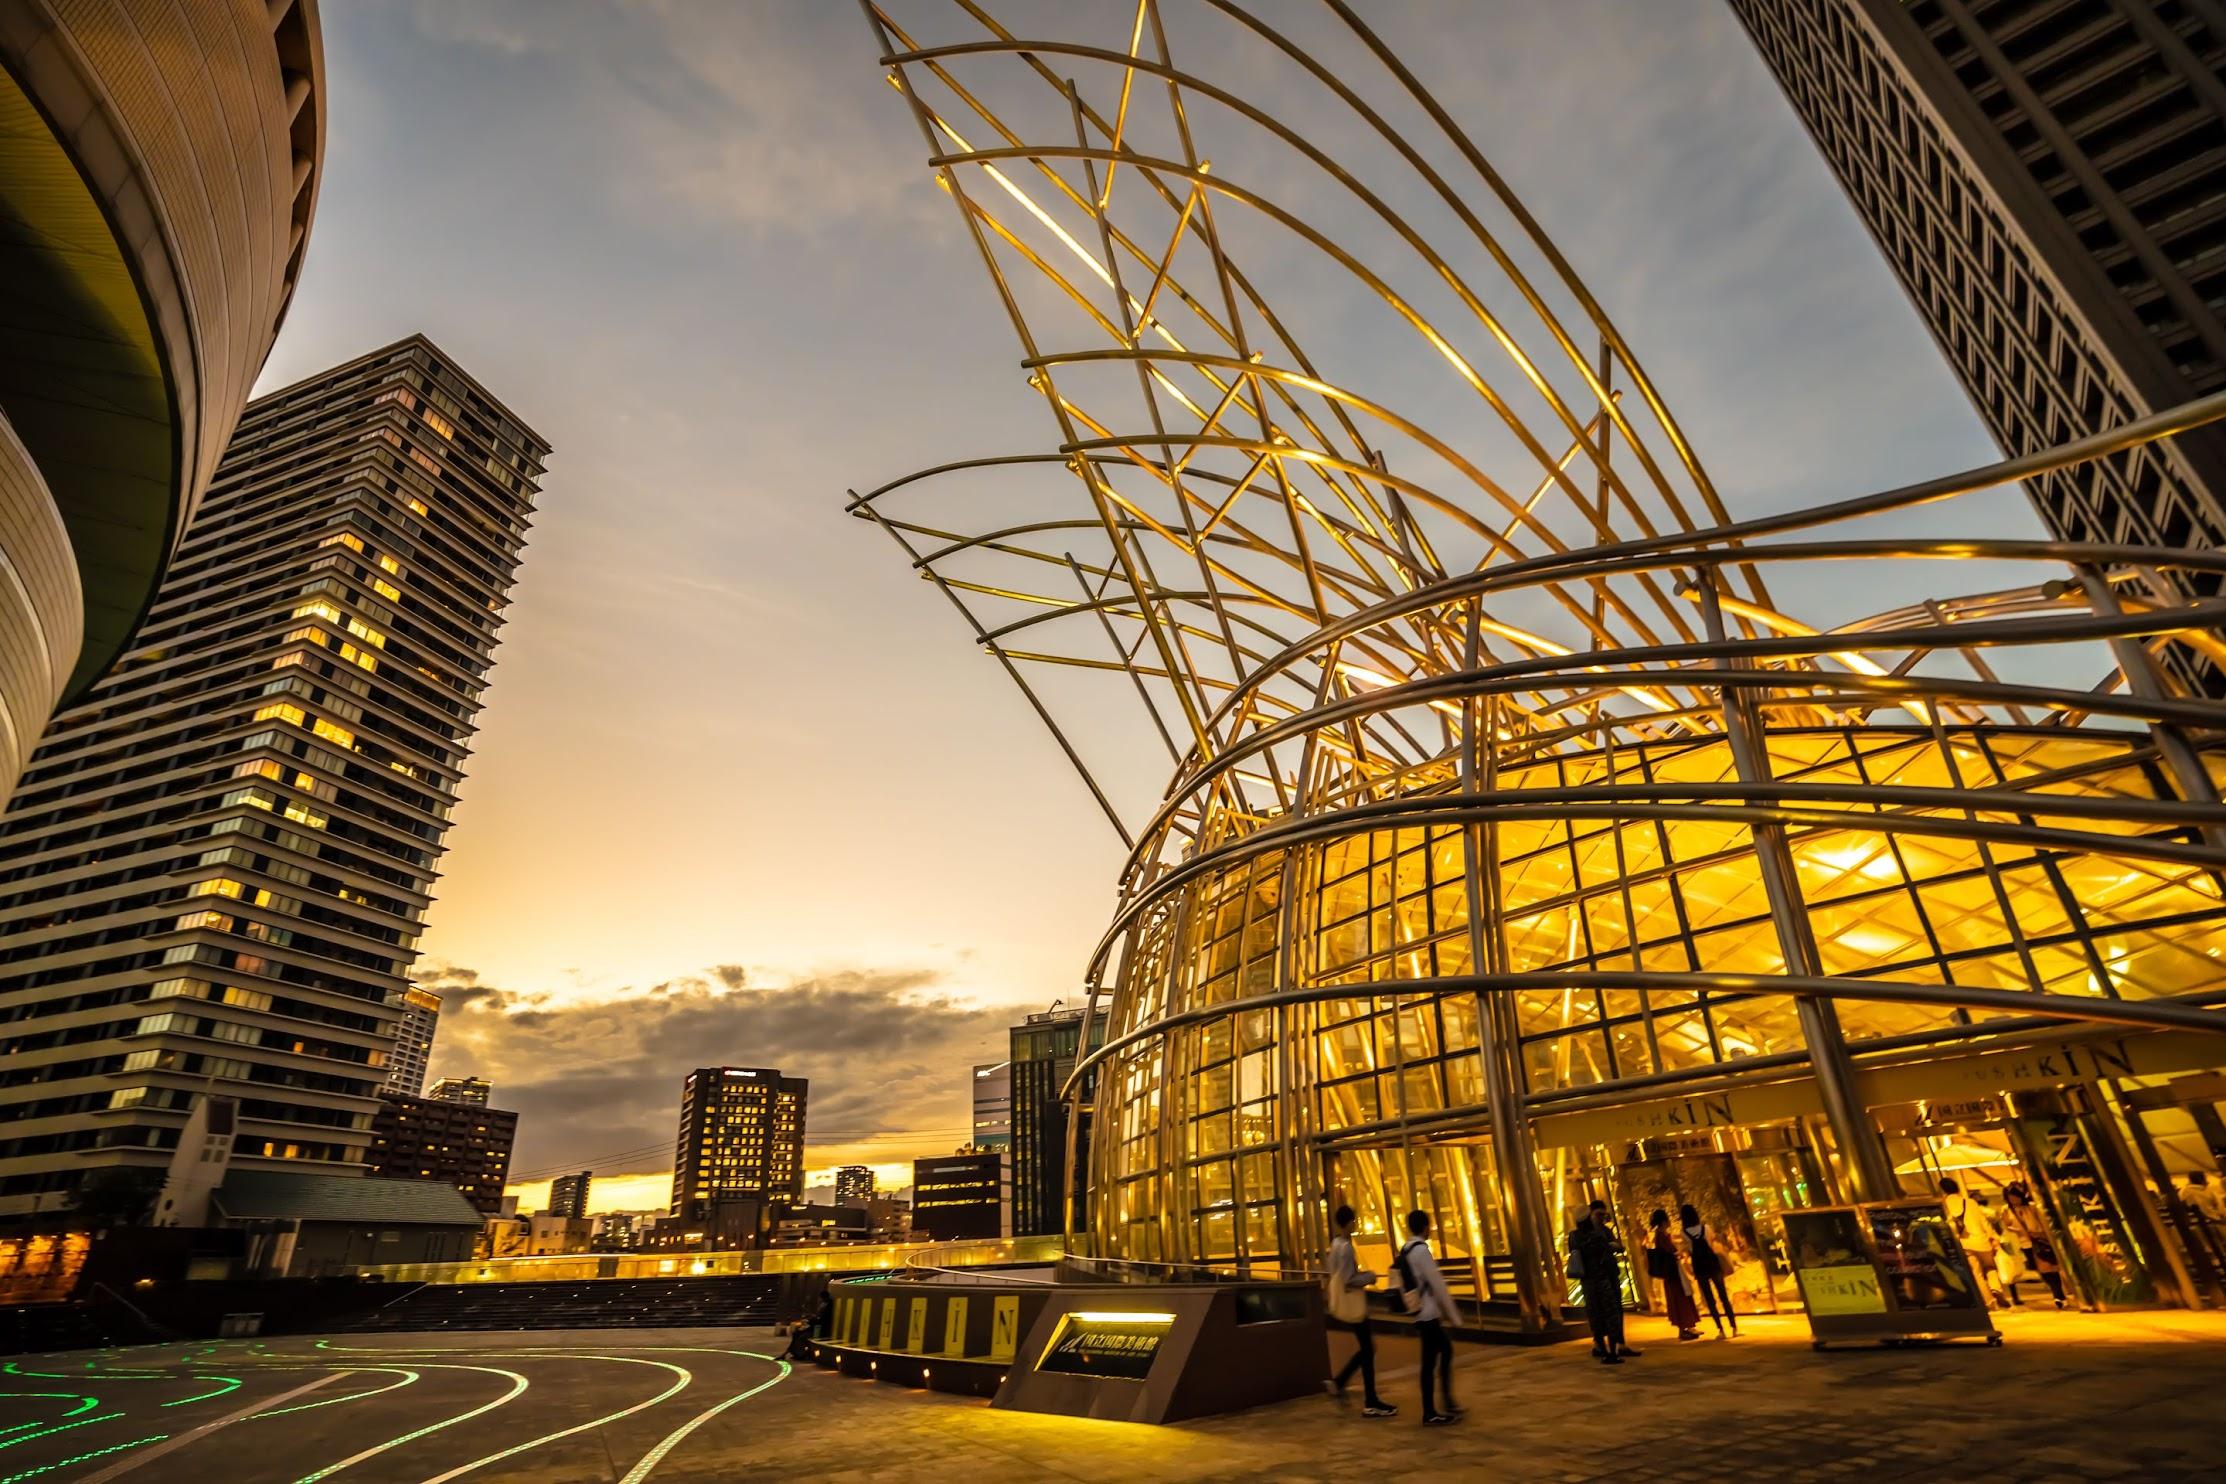 The National Museum of Art, Osaka light-up2